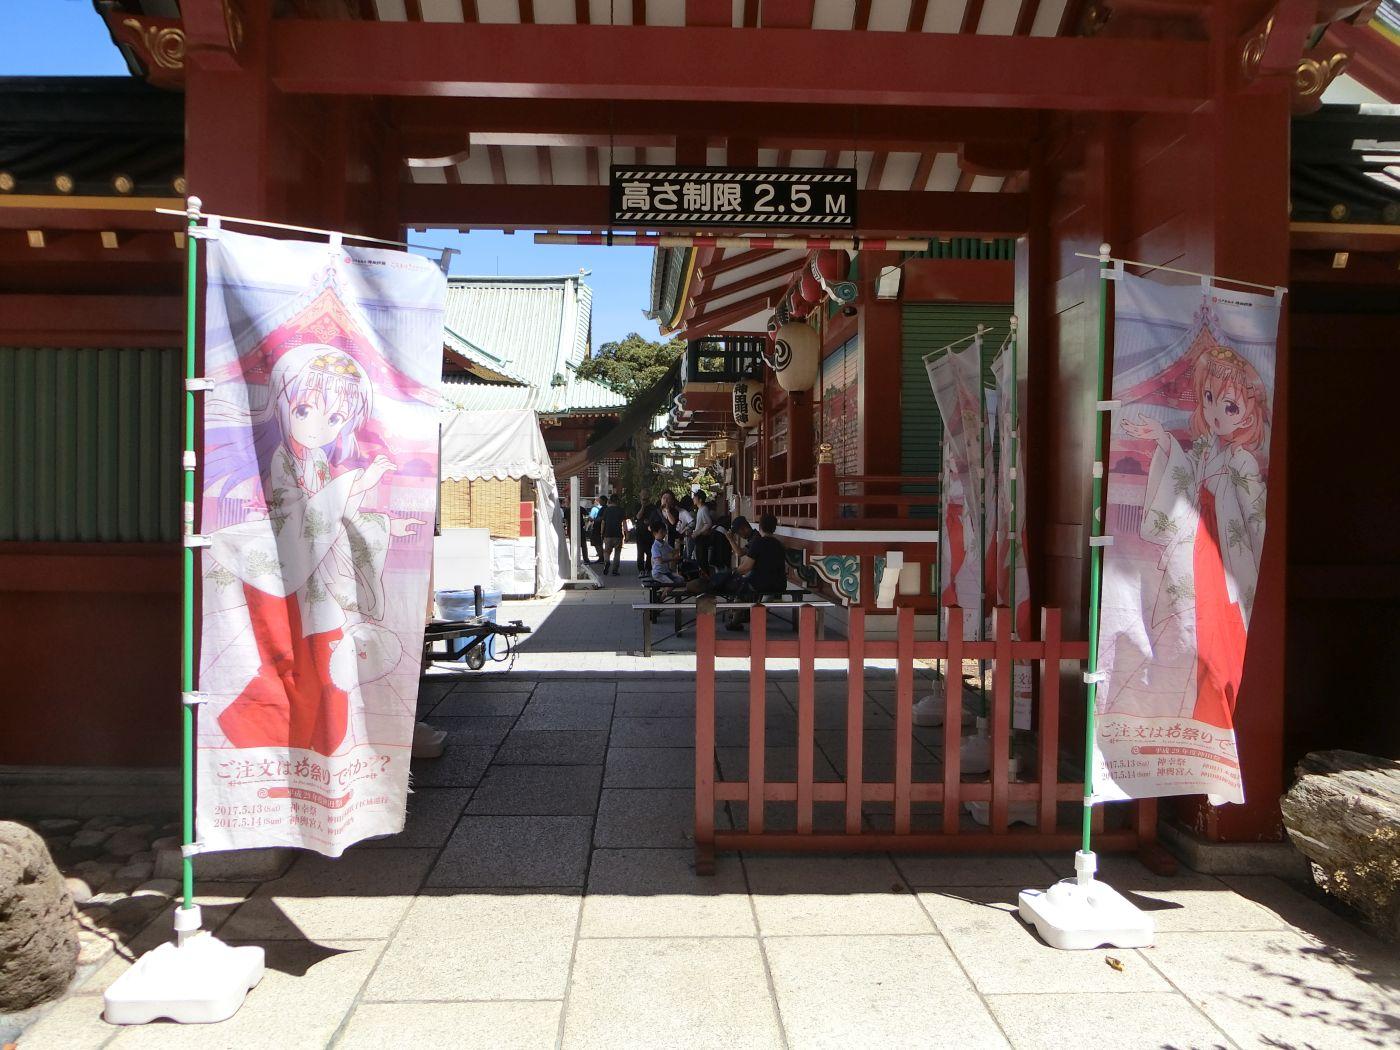 Tokyo's Kanda Shrine: An Experience of Faith and Tradition